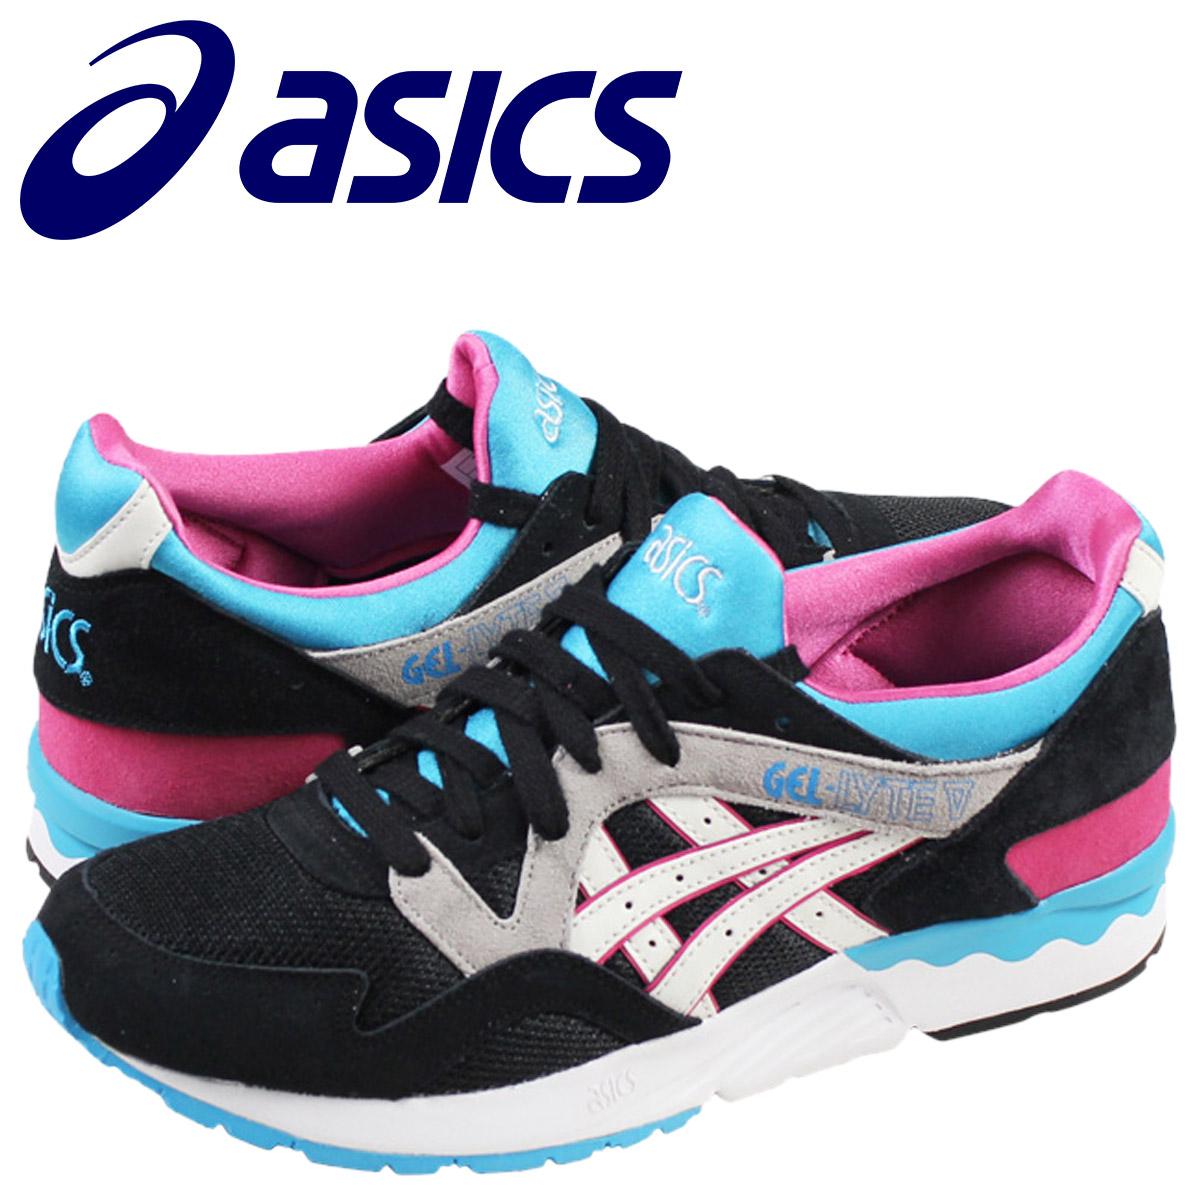 newest 380ad 6e115 asics ASICS gel light 5 sneakers GEL-LYTE 5 TH508L-9001 men shoes black  black